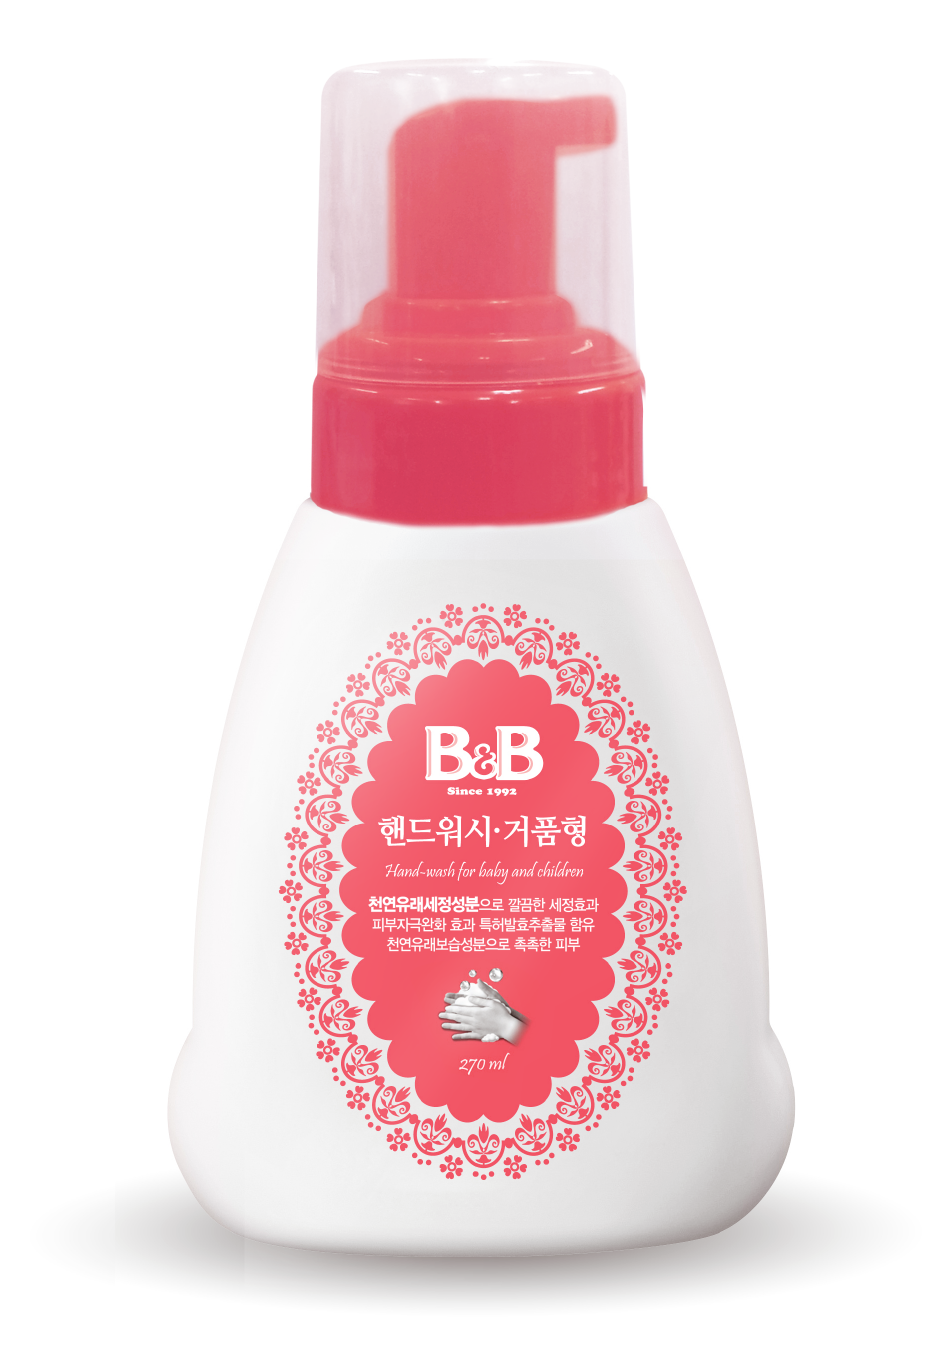 B&B foam Handwash